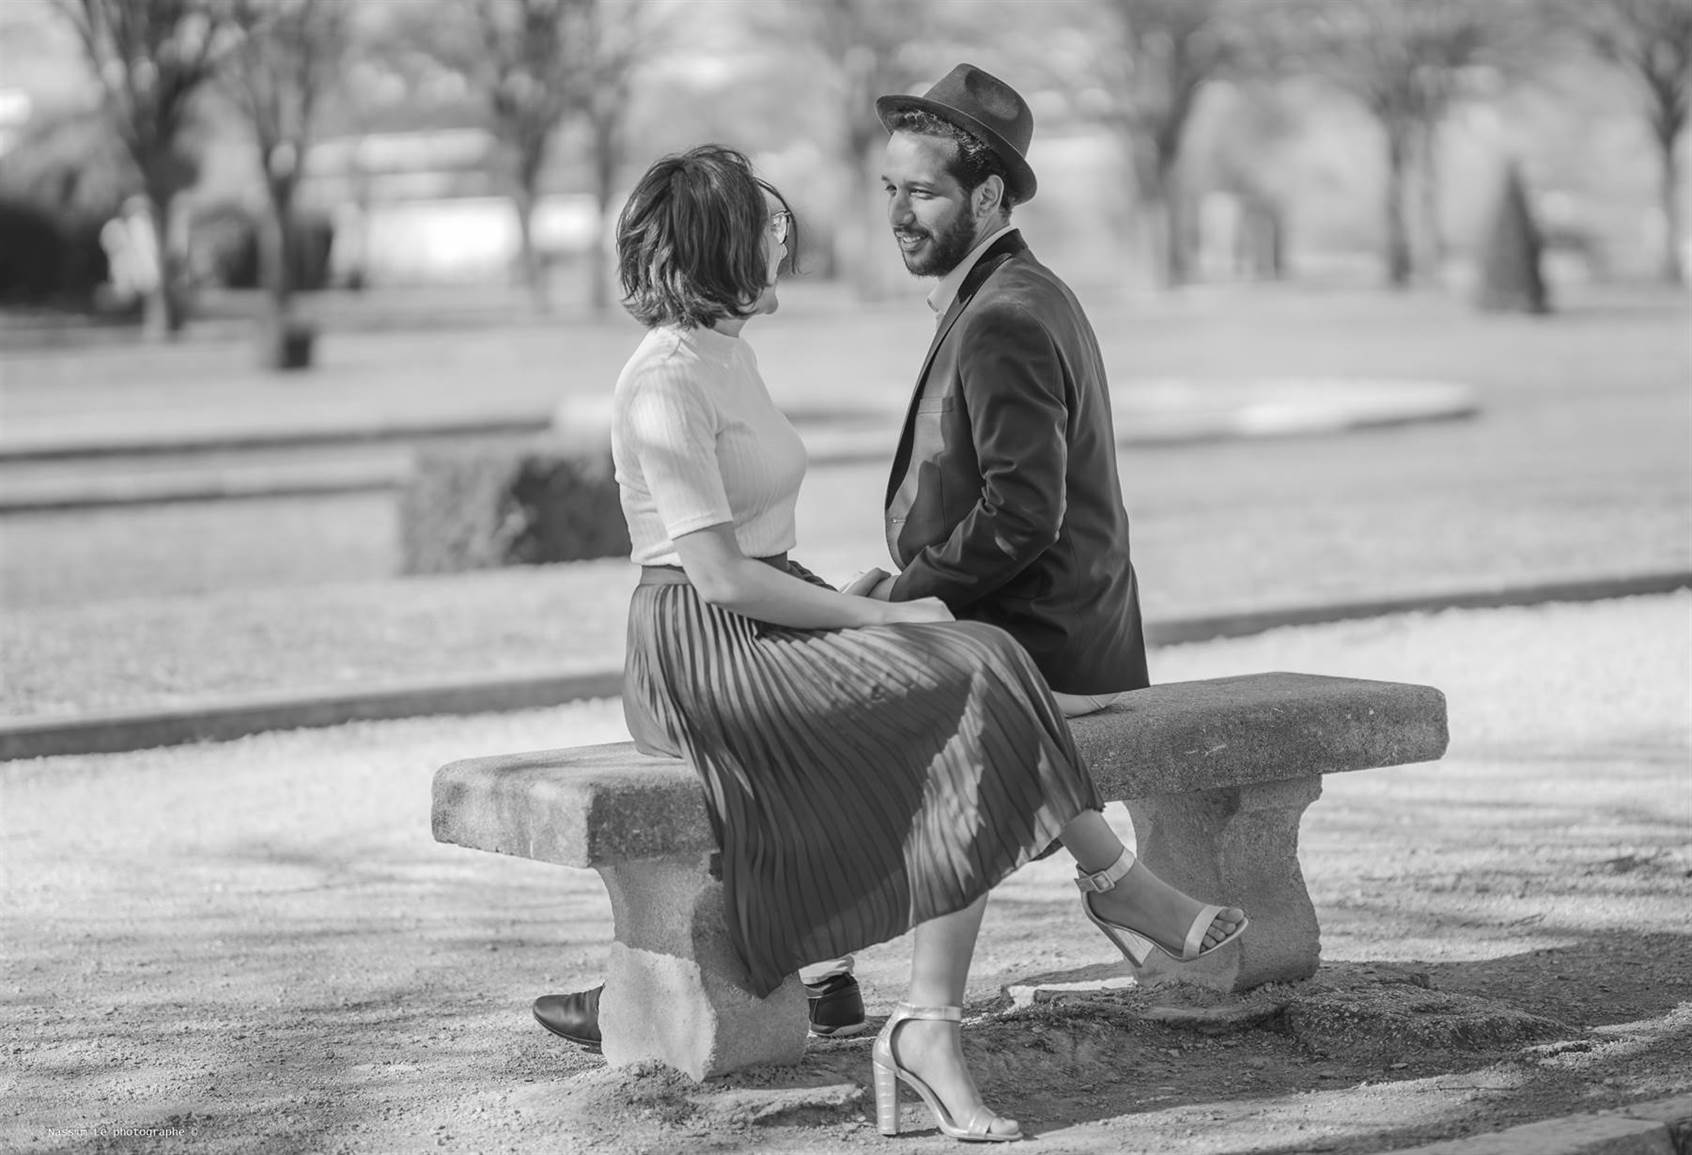 séance shooting couple